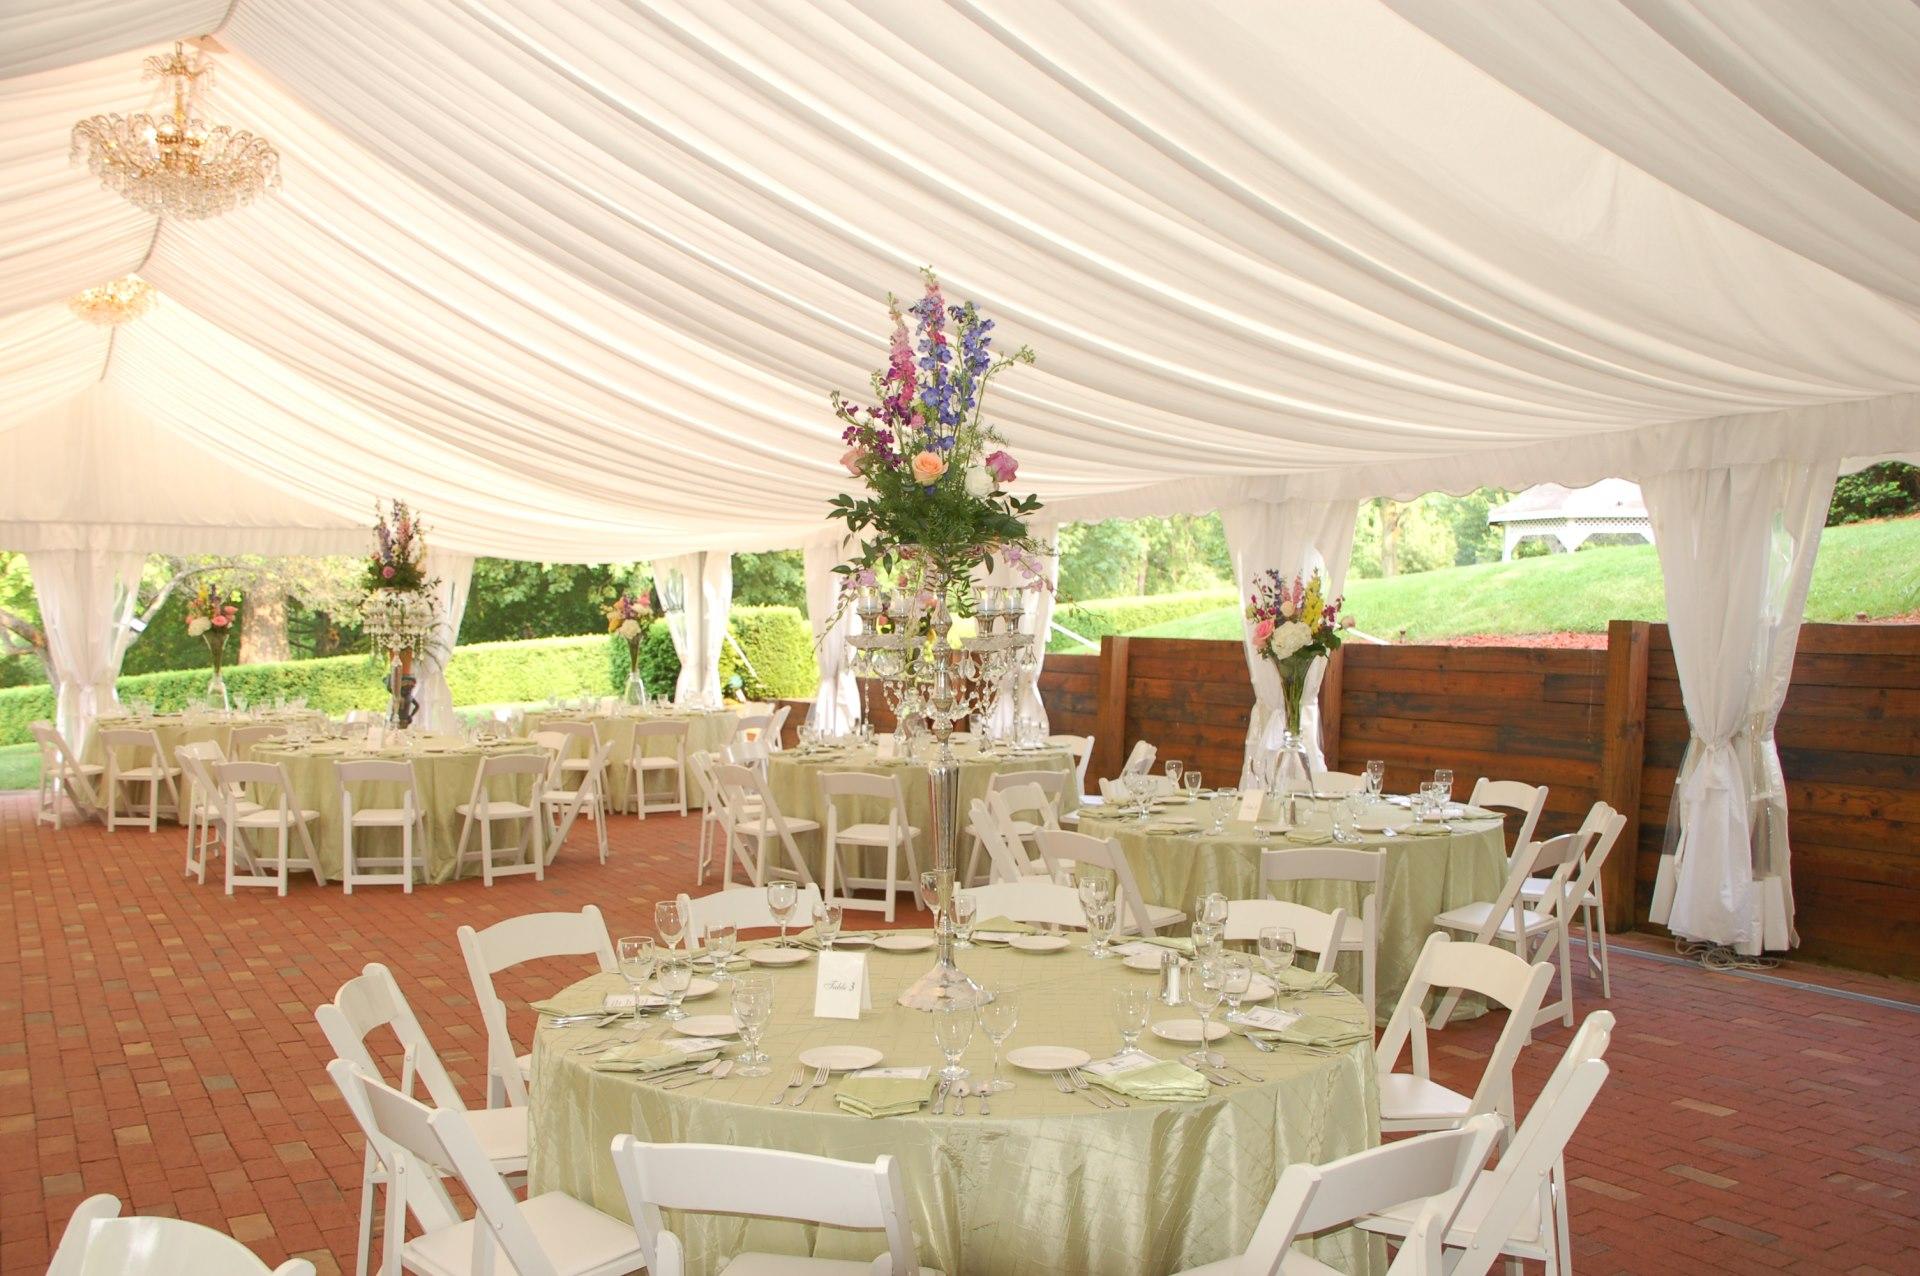 Tara A Country Inn Weddings and Events (1)